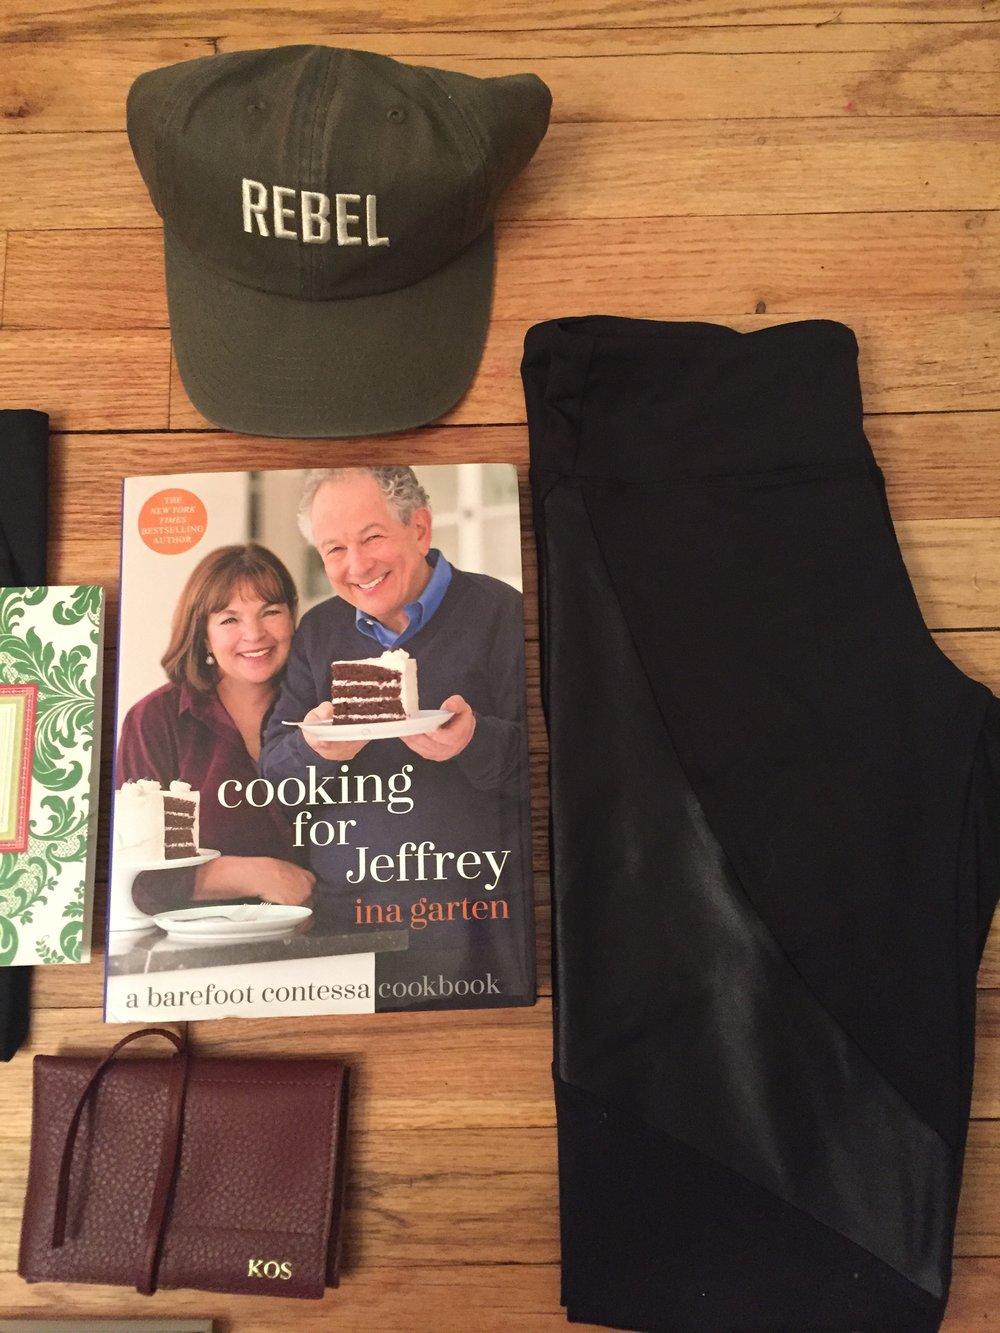 NEFF x STAR WARS Rebel Strapback Hat Cooking for Jeffery: A Barefoot Contessa Cookbook  KORAL Forge Compression Workout Legging